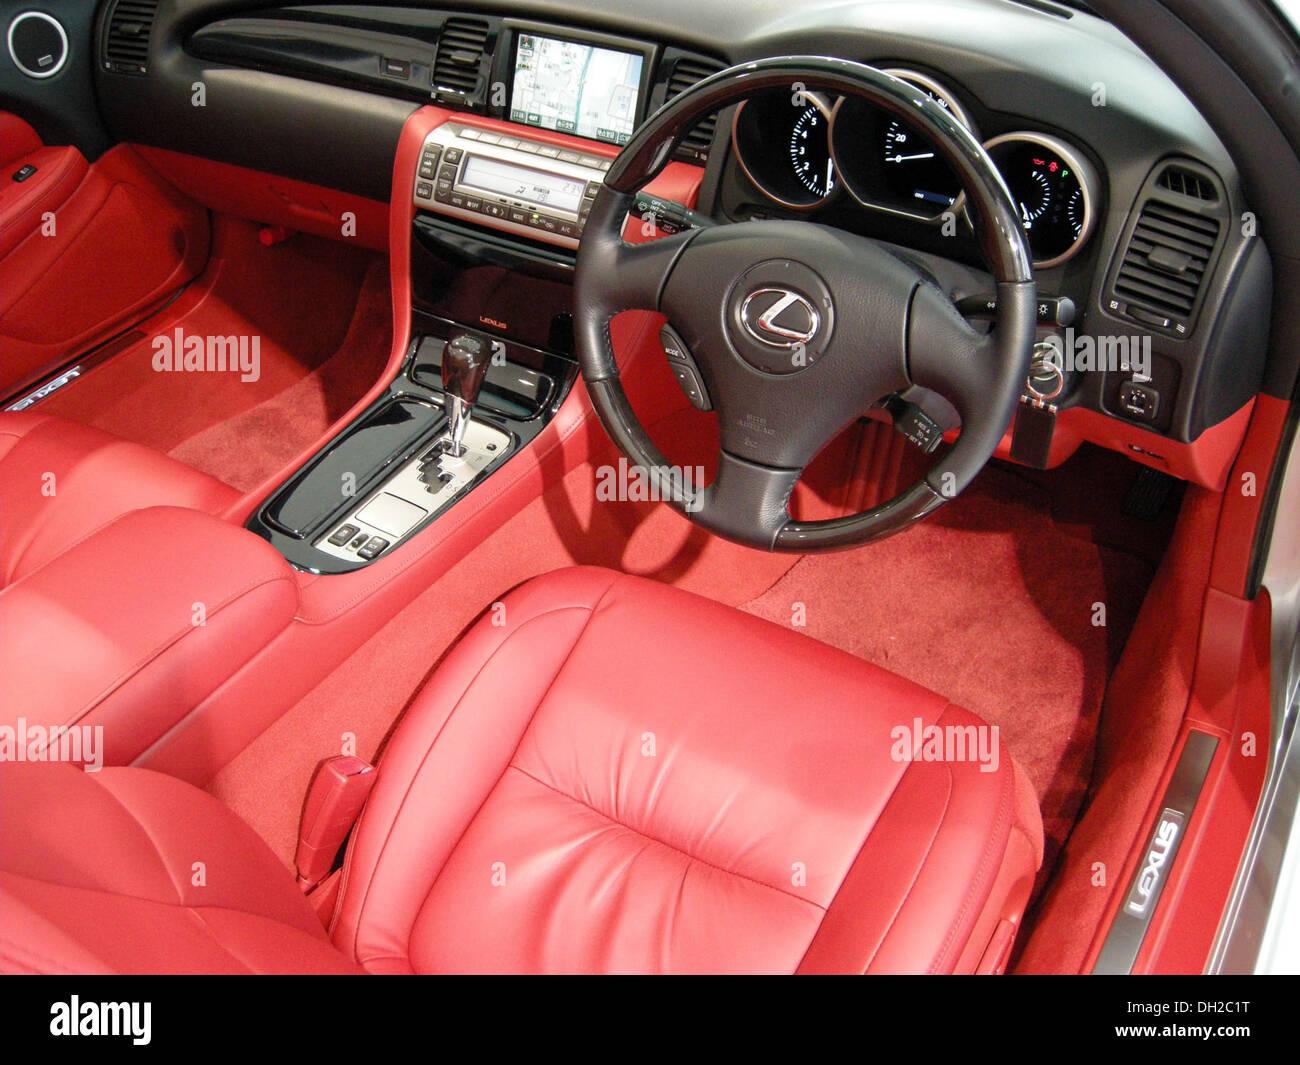 Lexus Sc430 Stock Photos & Lexus Sc430 Stock Images - Alamy